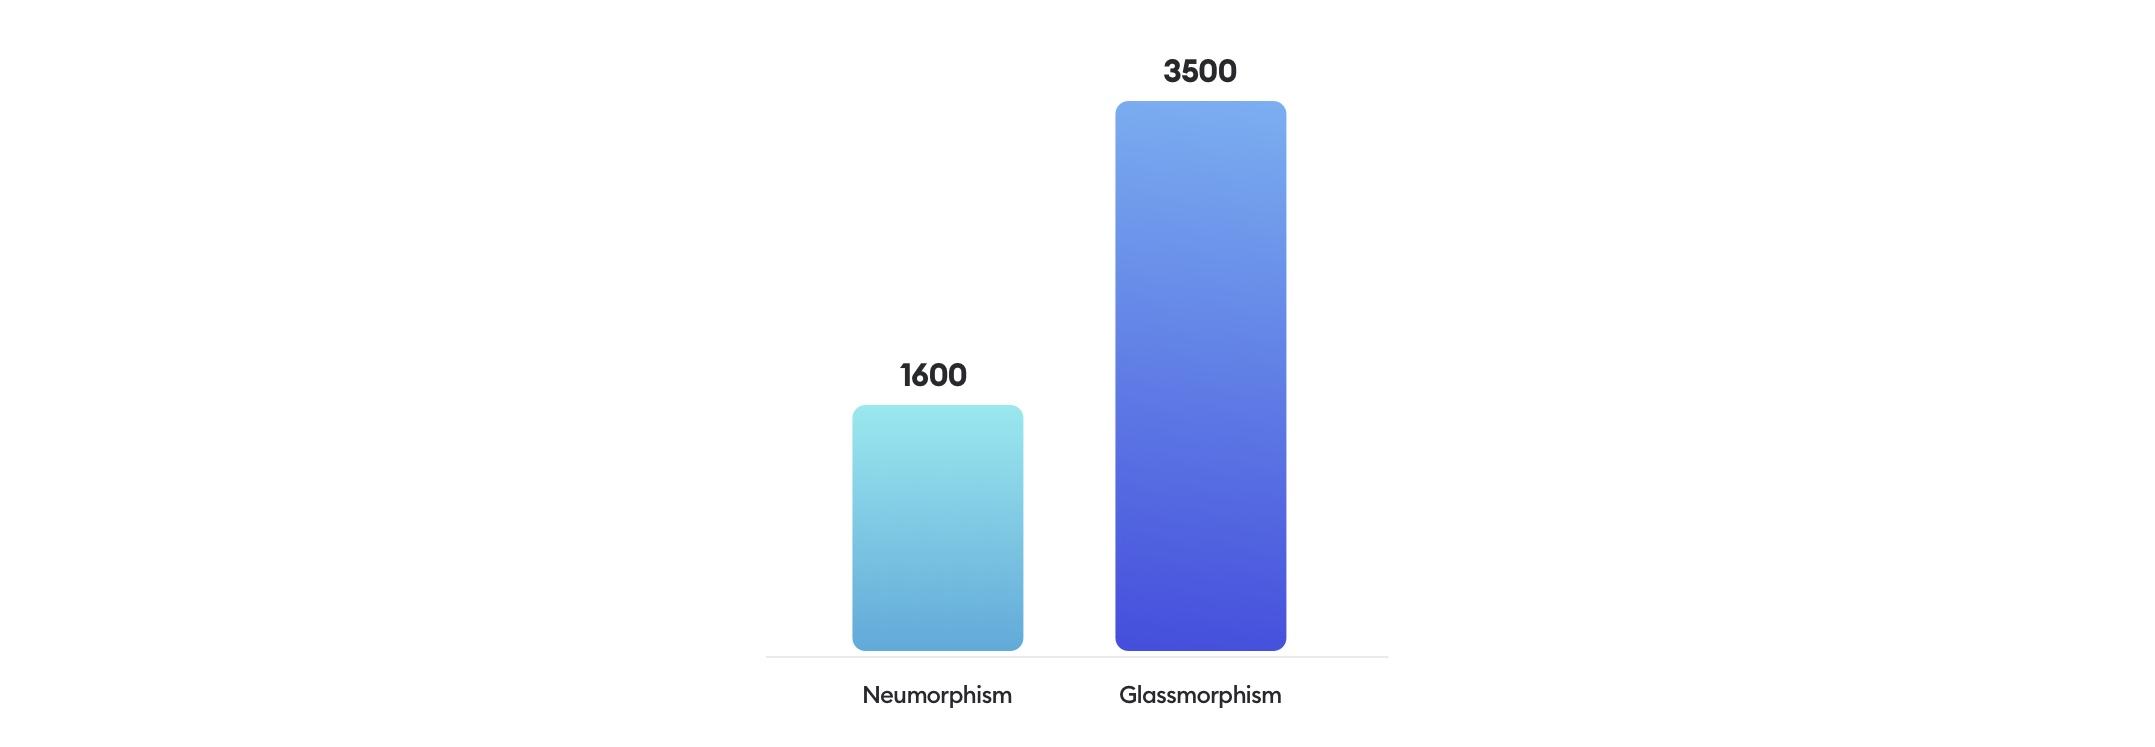 Glassmorphism vs neumorphism popularity